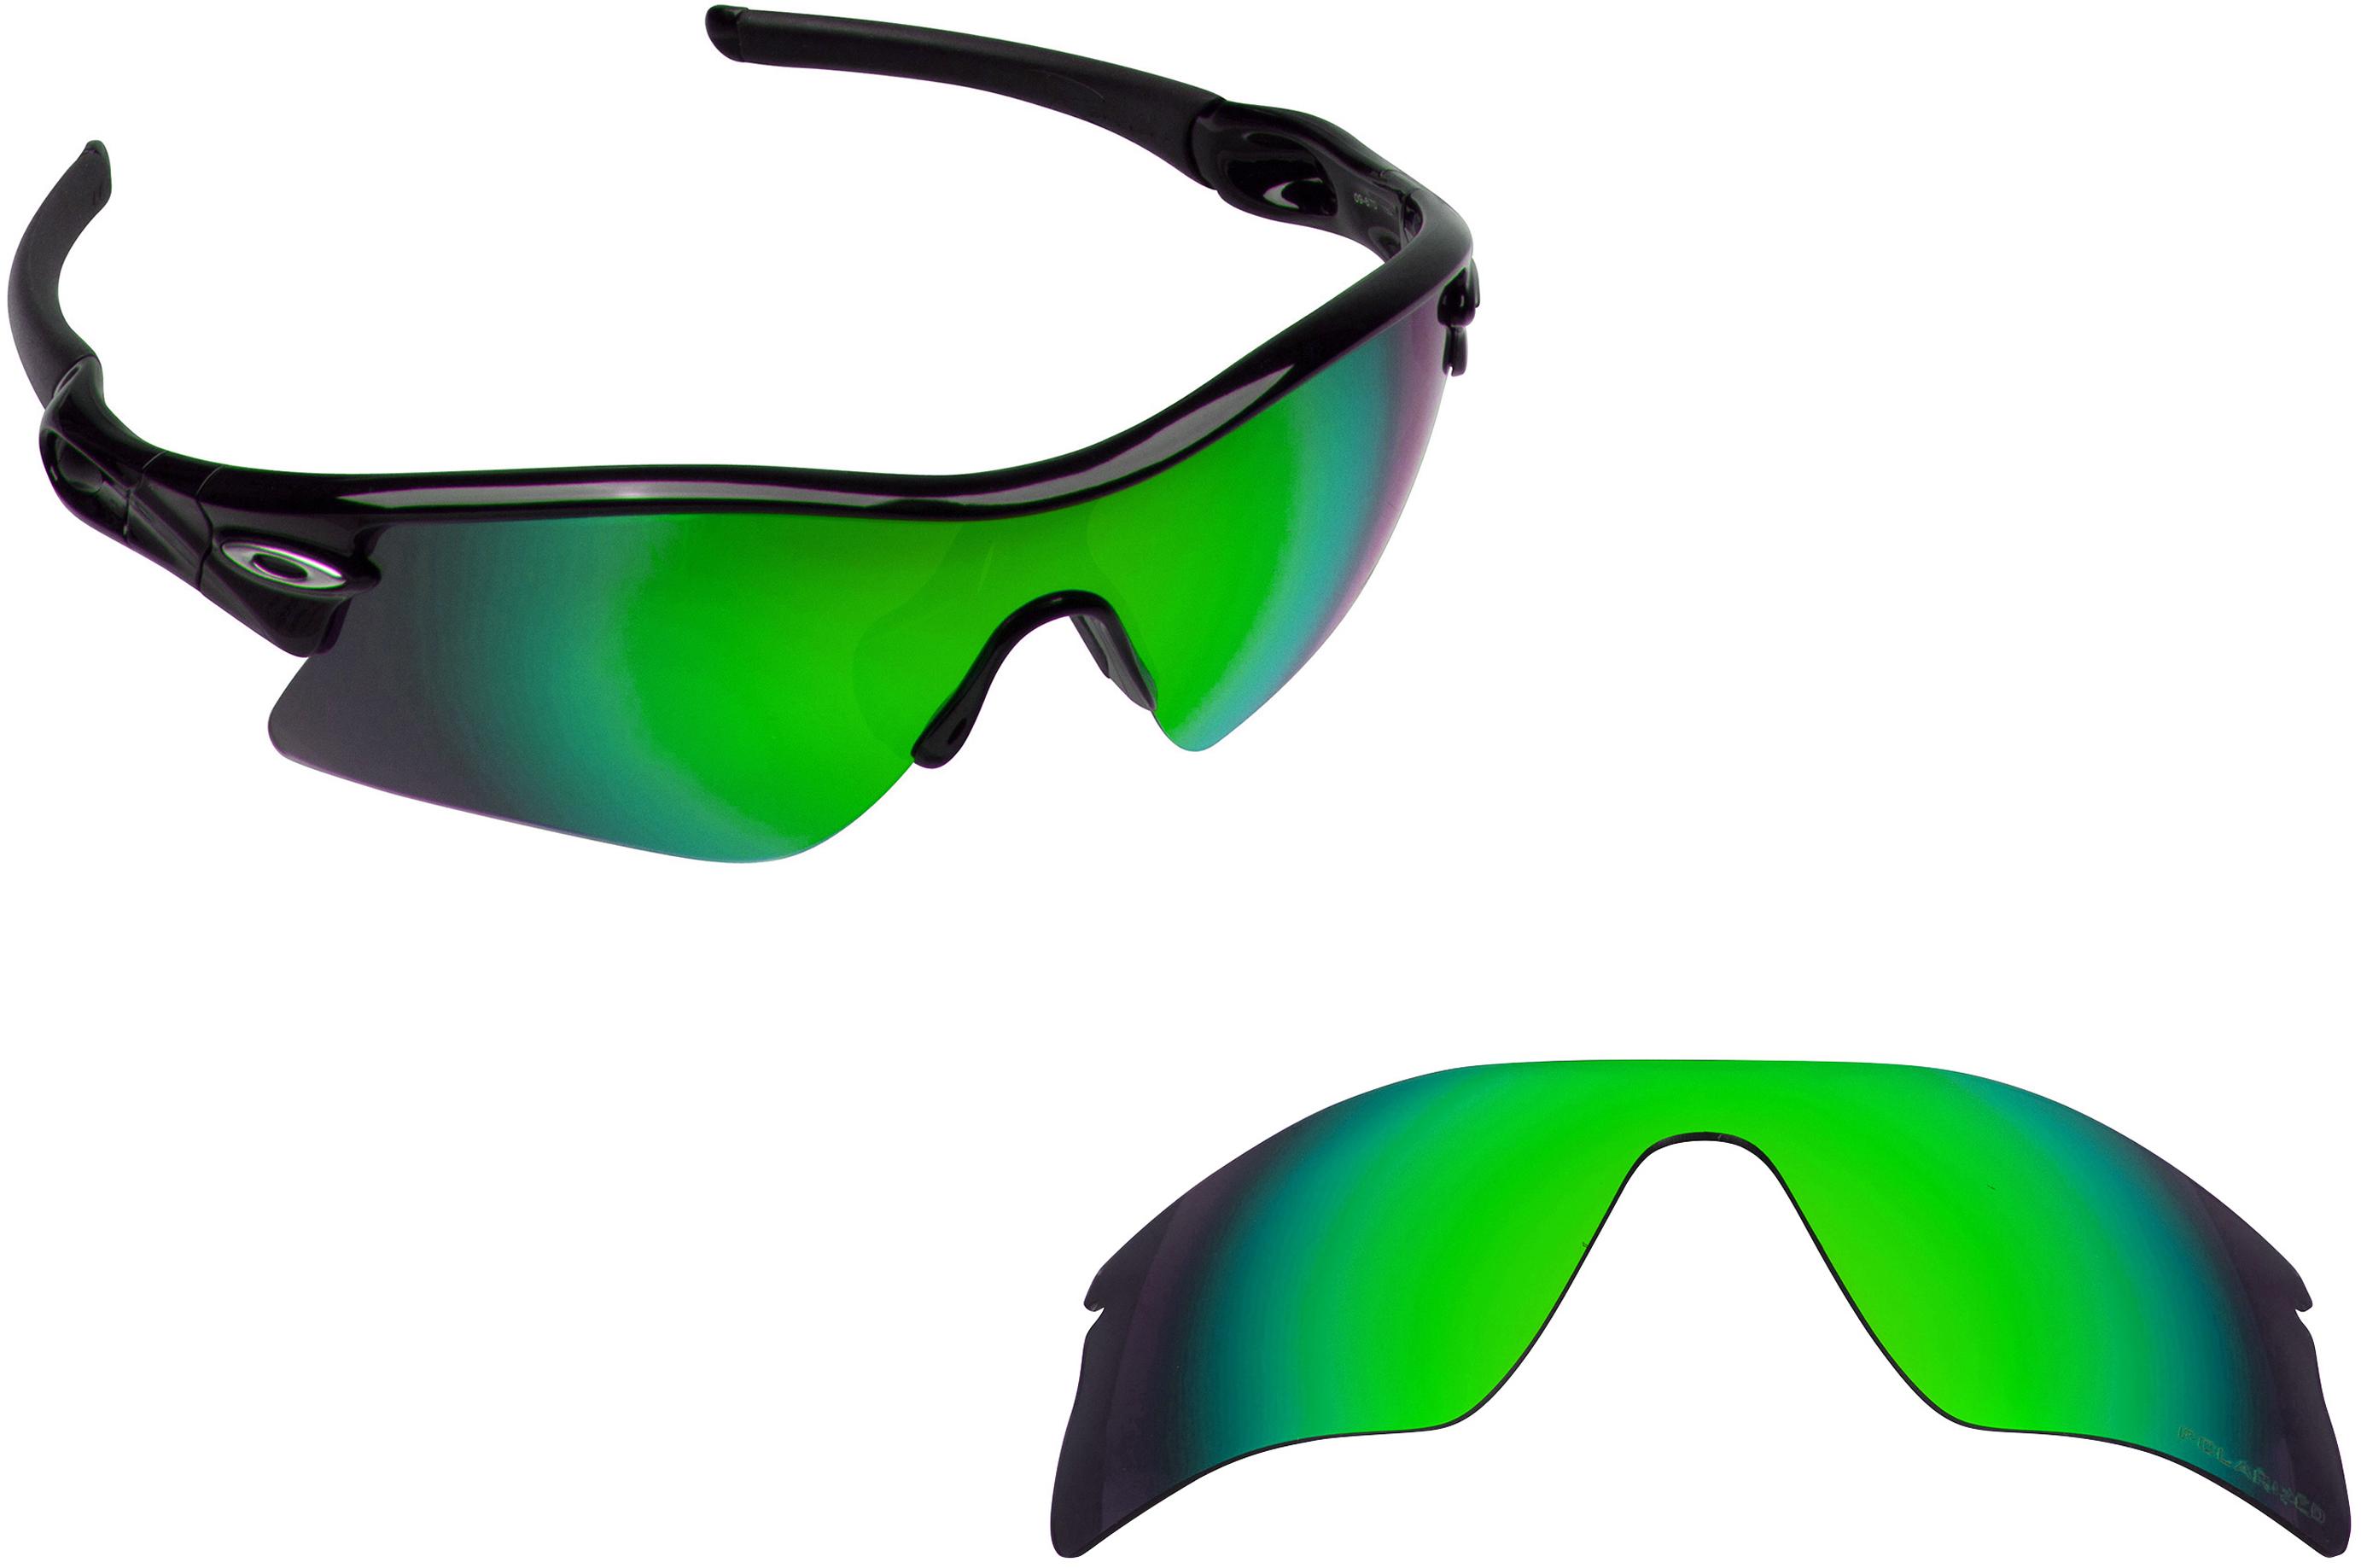 94e7920e07 ... amazon difference between oakley polarized and nonpolarized sunglasses  6f9fa 62ab5